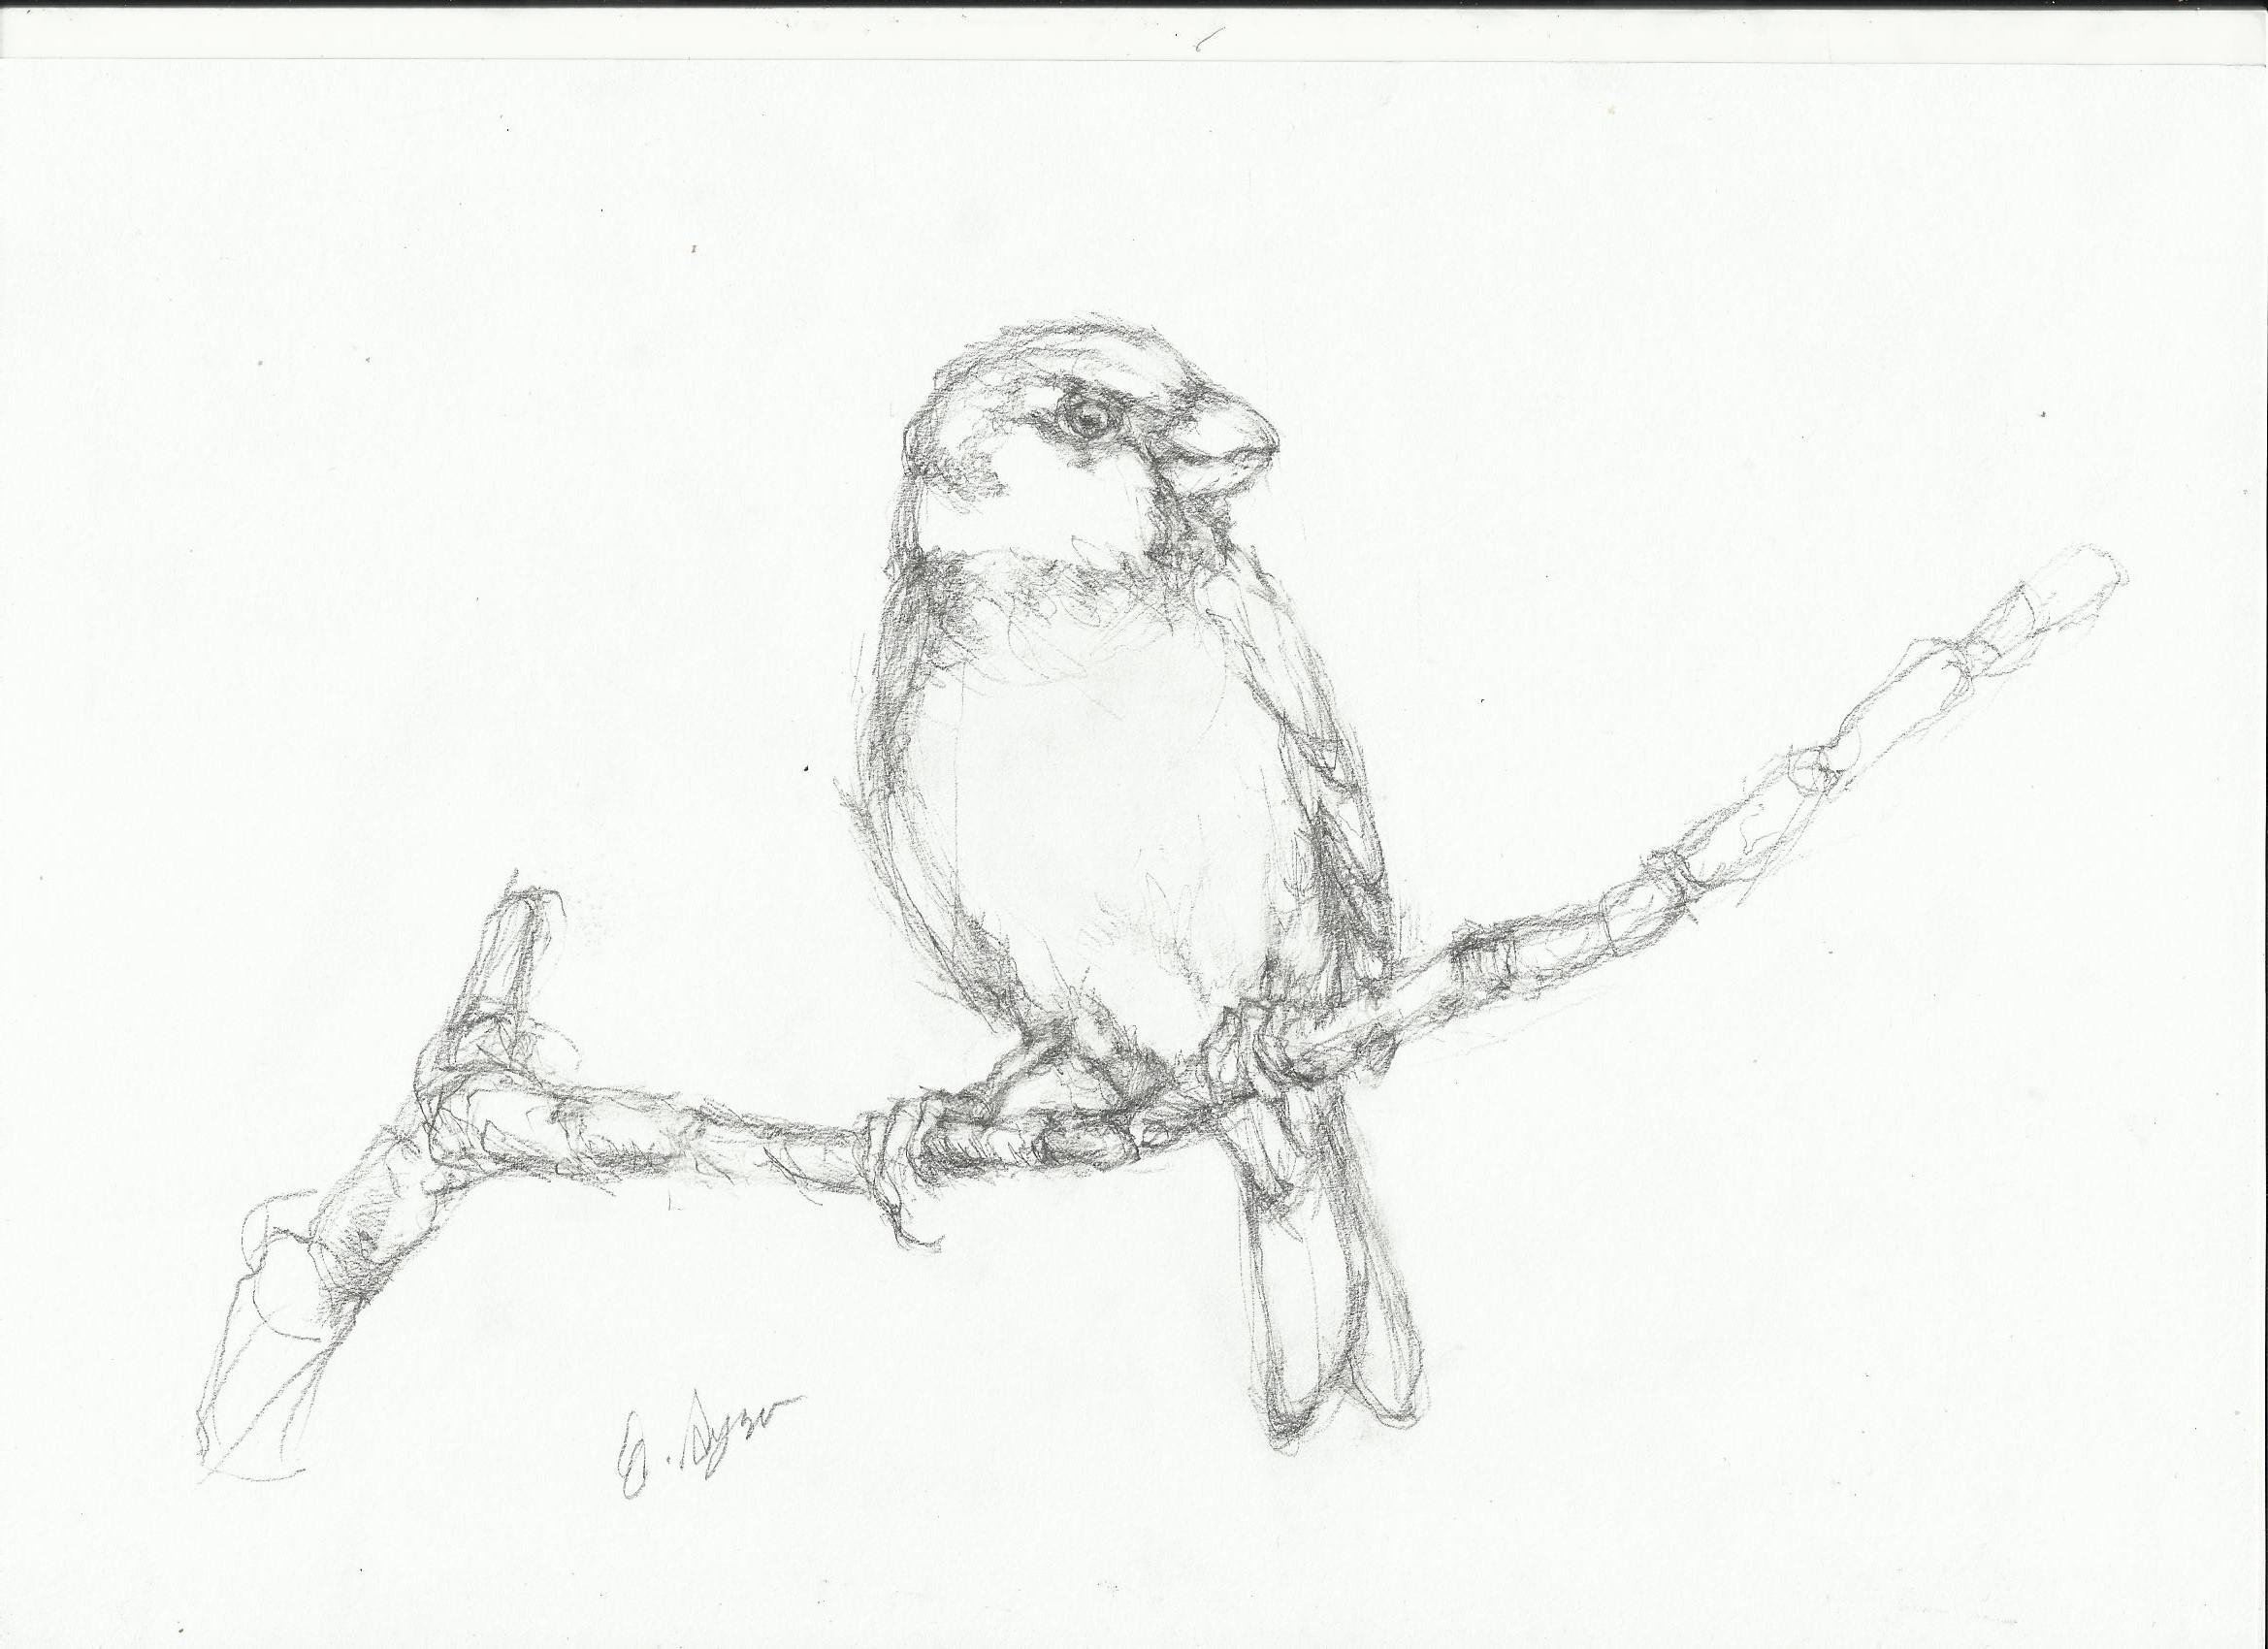 2338x1700 Sparrow Drawing Nightwithdeer